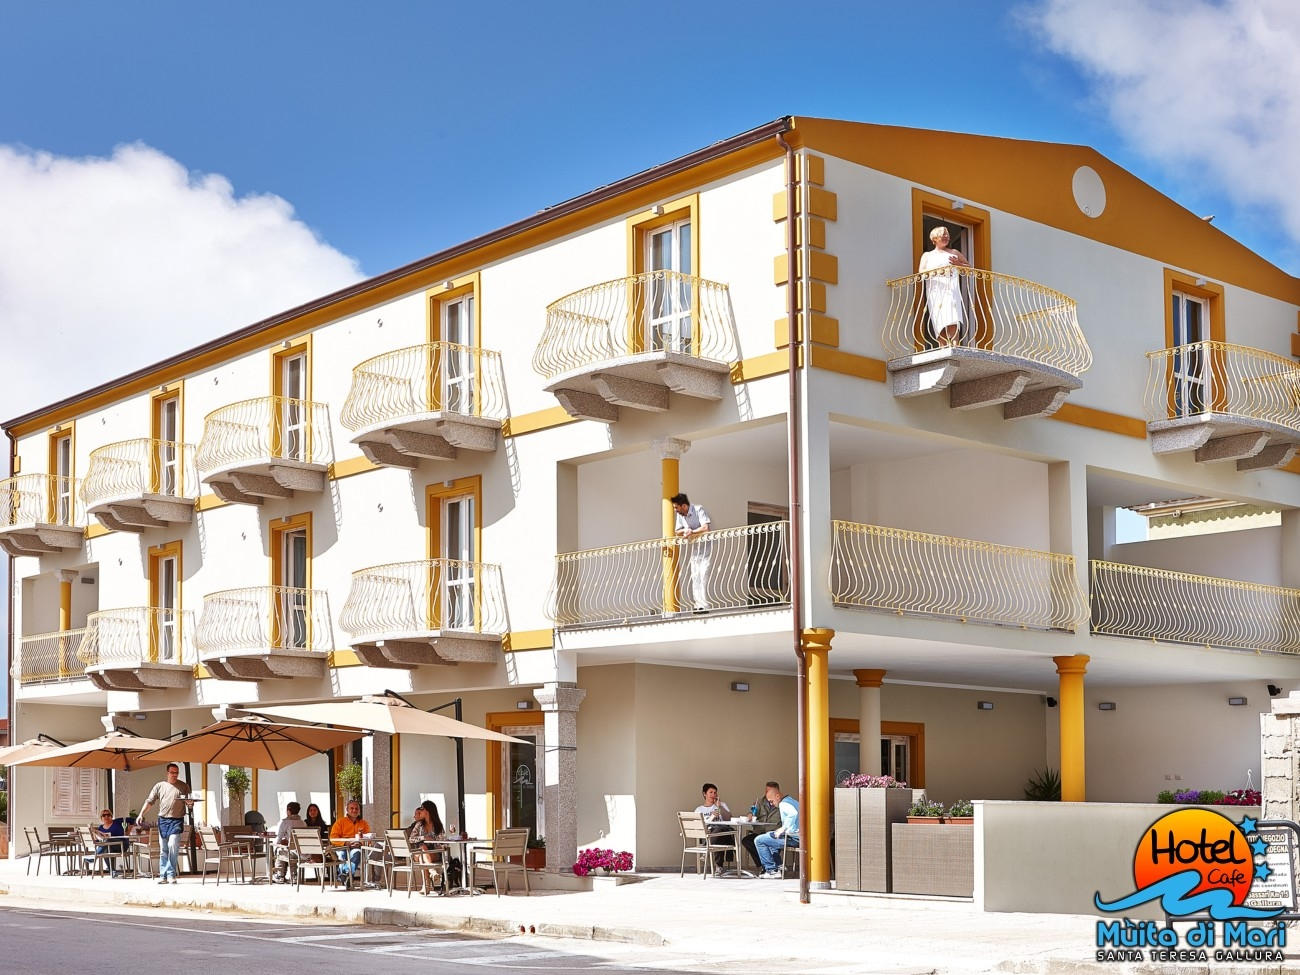 Hotel soggiorni in Sardegna